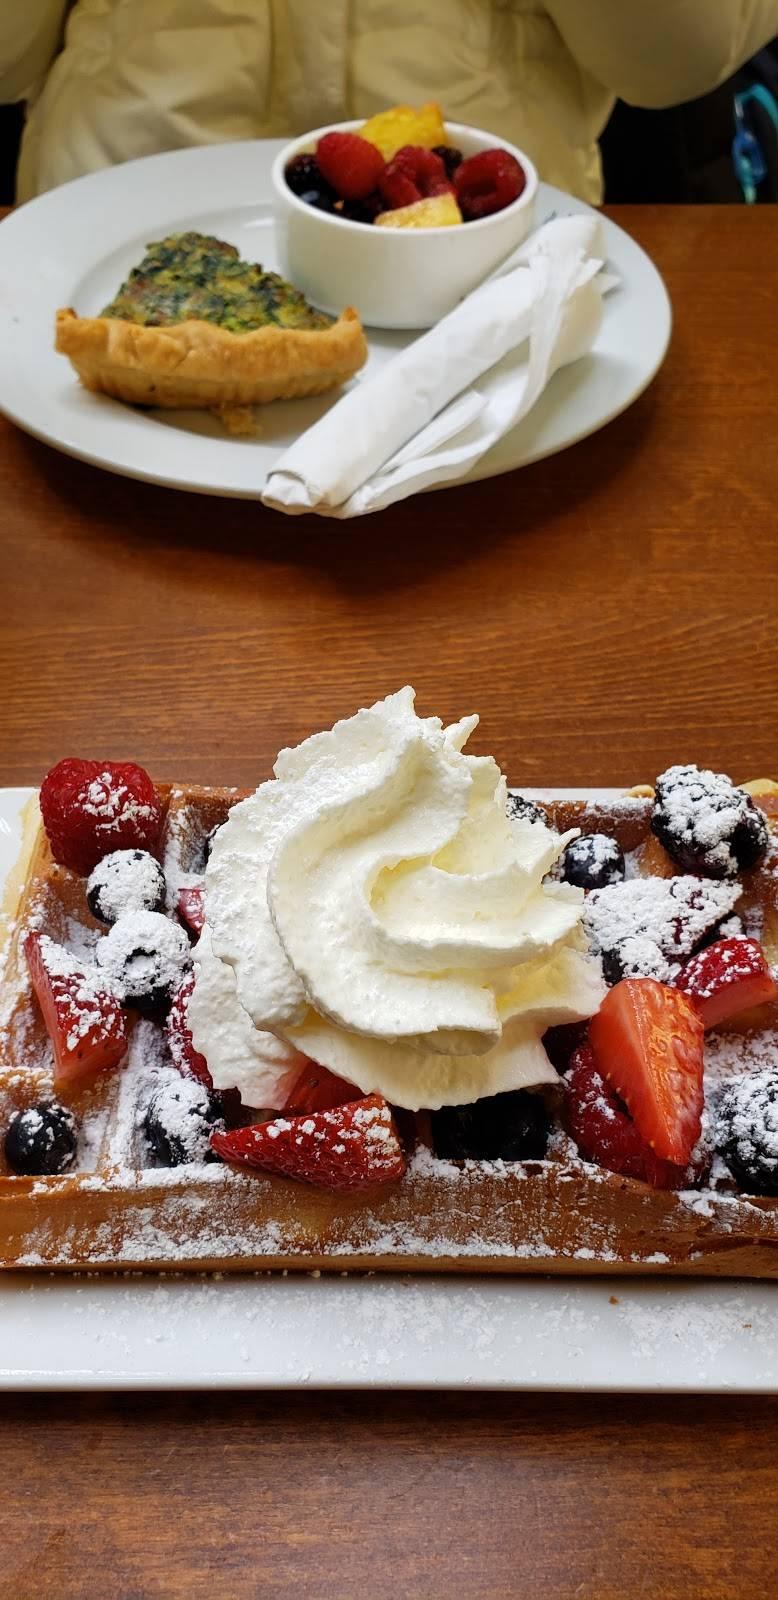 Corner Bakery Cafe   bakery   3903B, 3903B Fair Ridge Dr, Fairfax, VA 22033, USA   7039348703 OR +1 703-934-8703